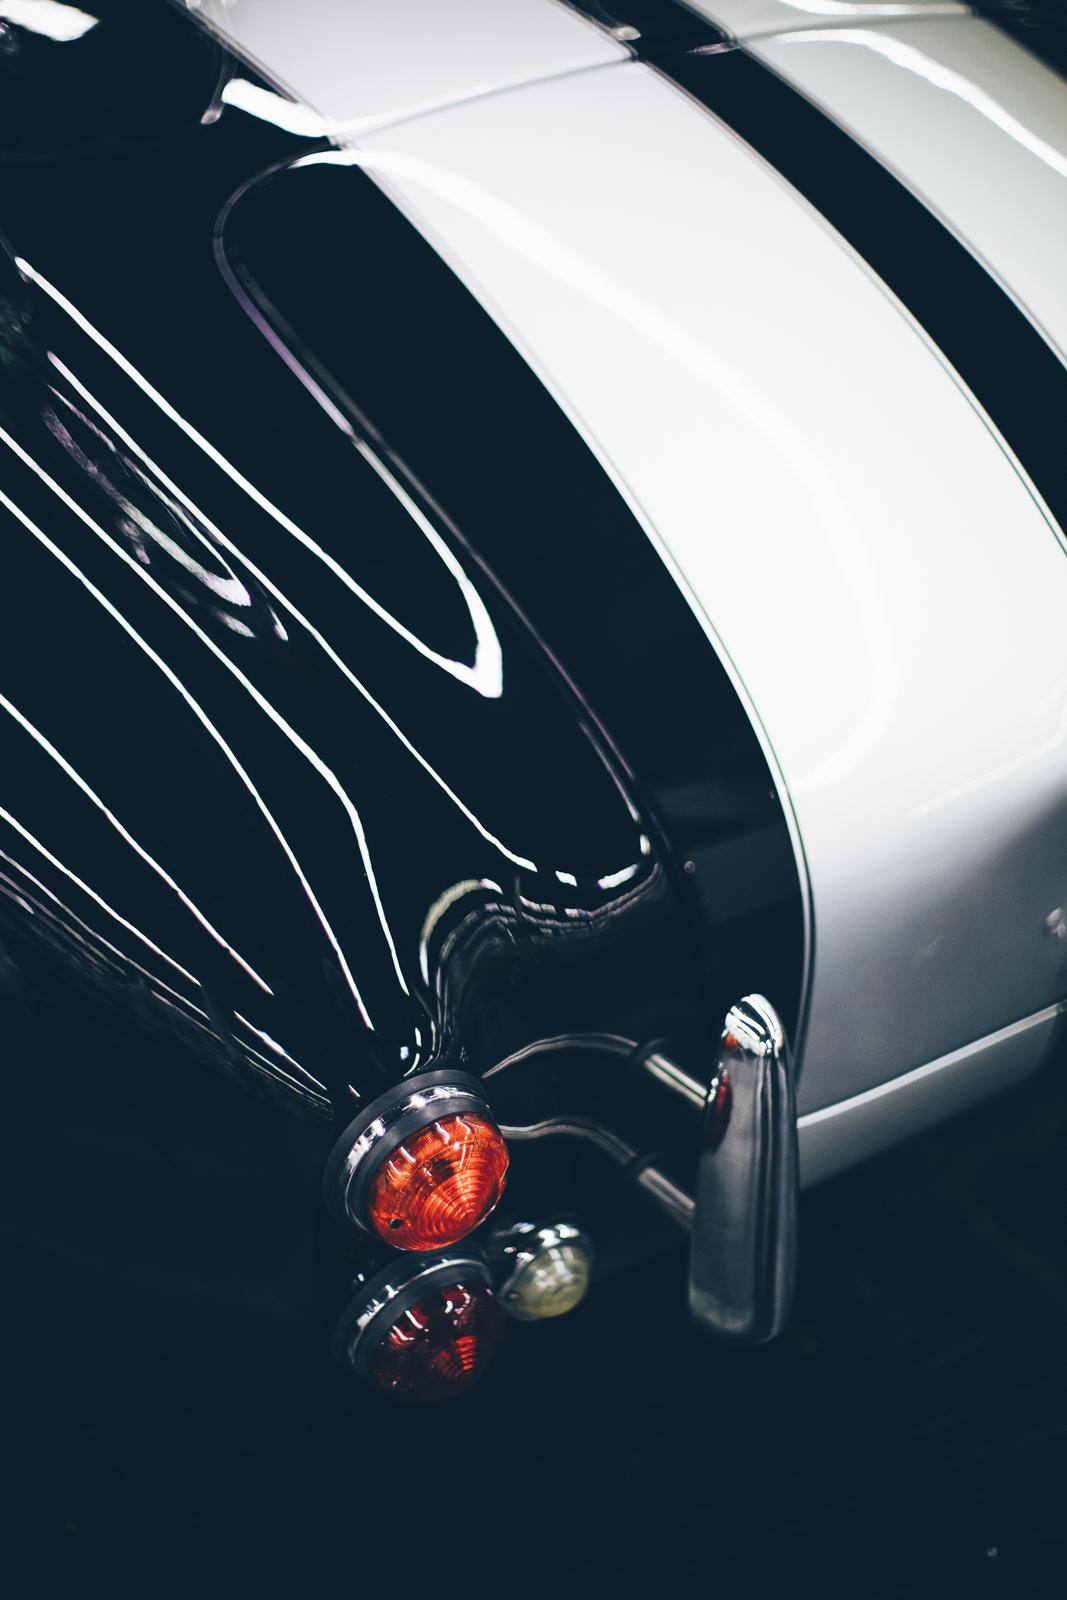 AC Cobra 427